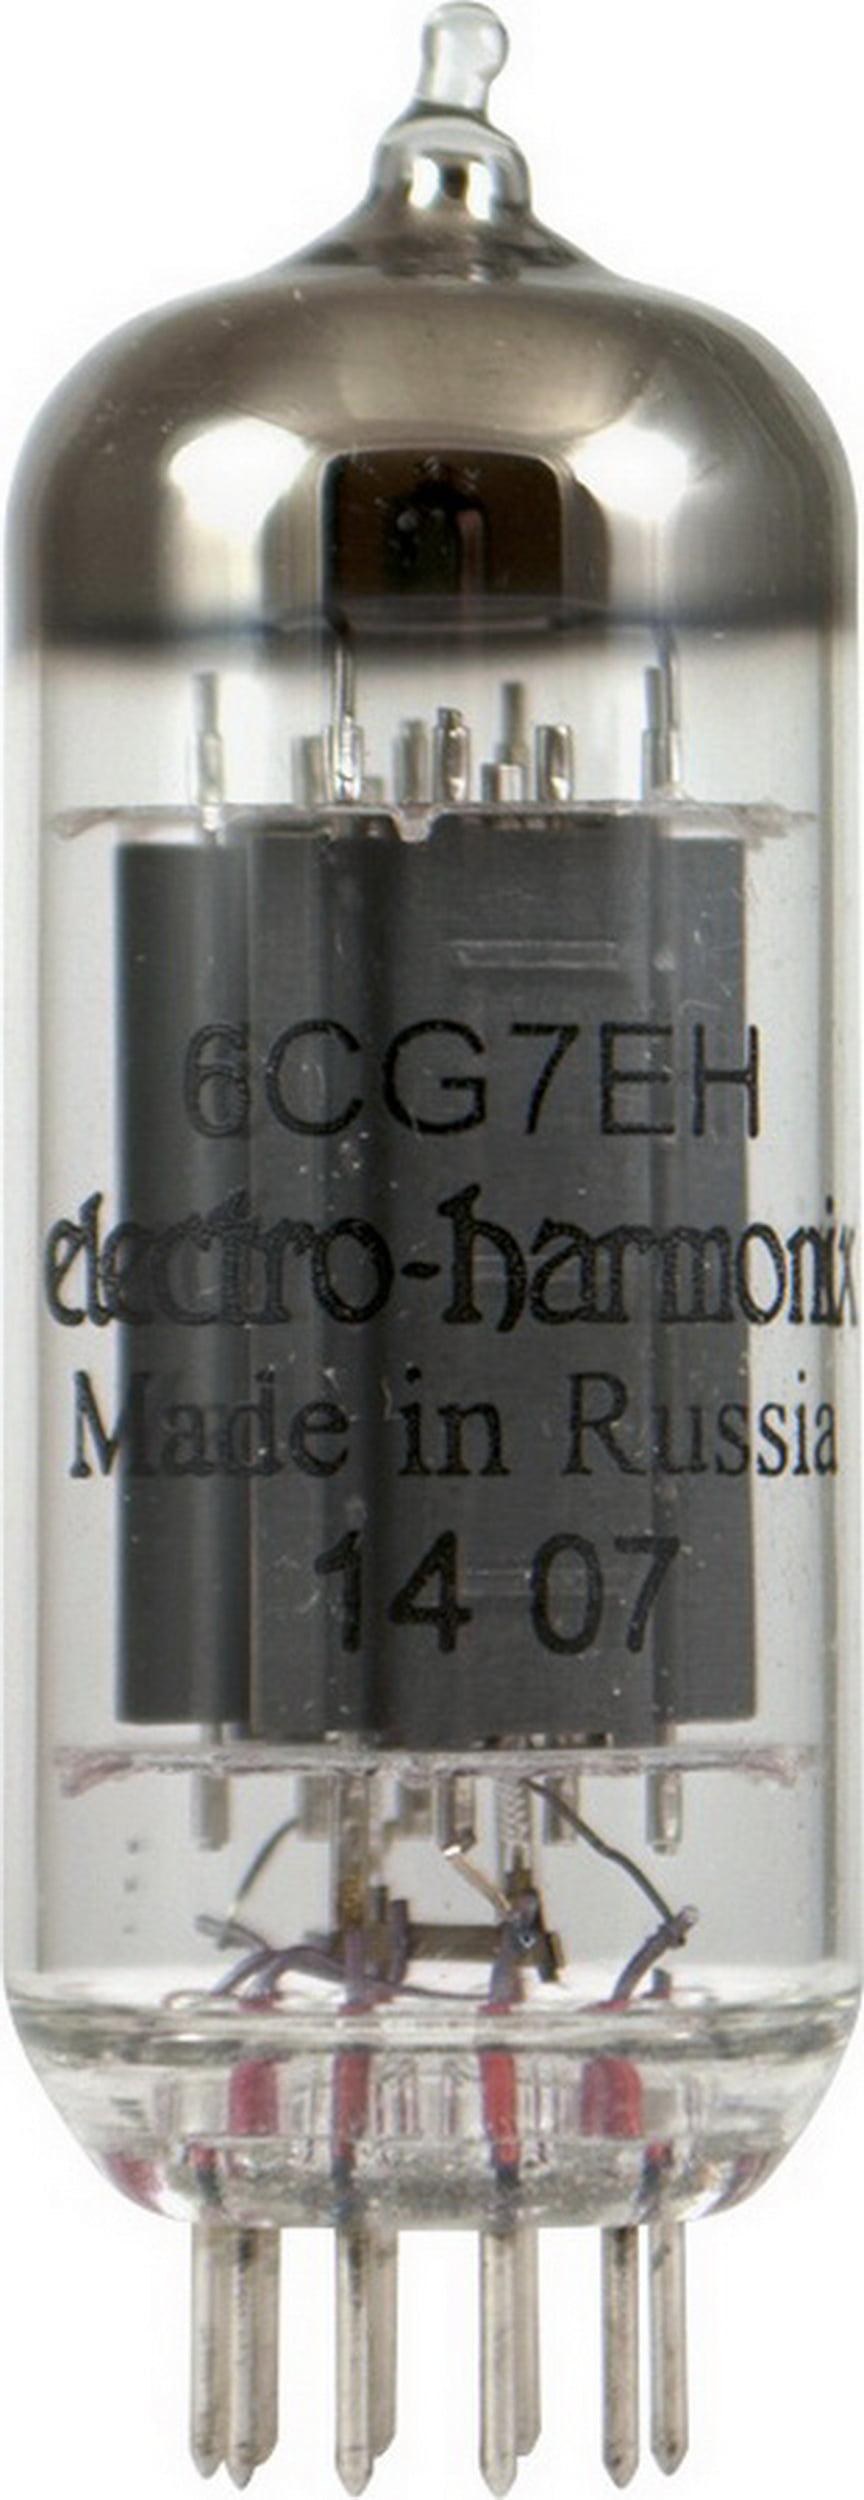 6CG7 Electro-Harmonix by